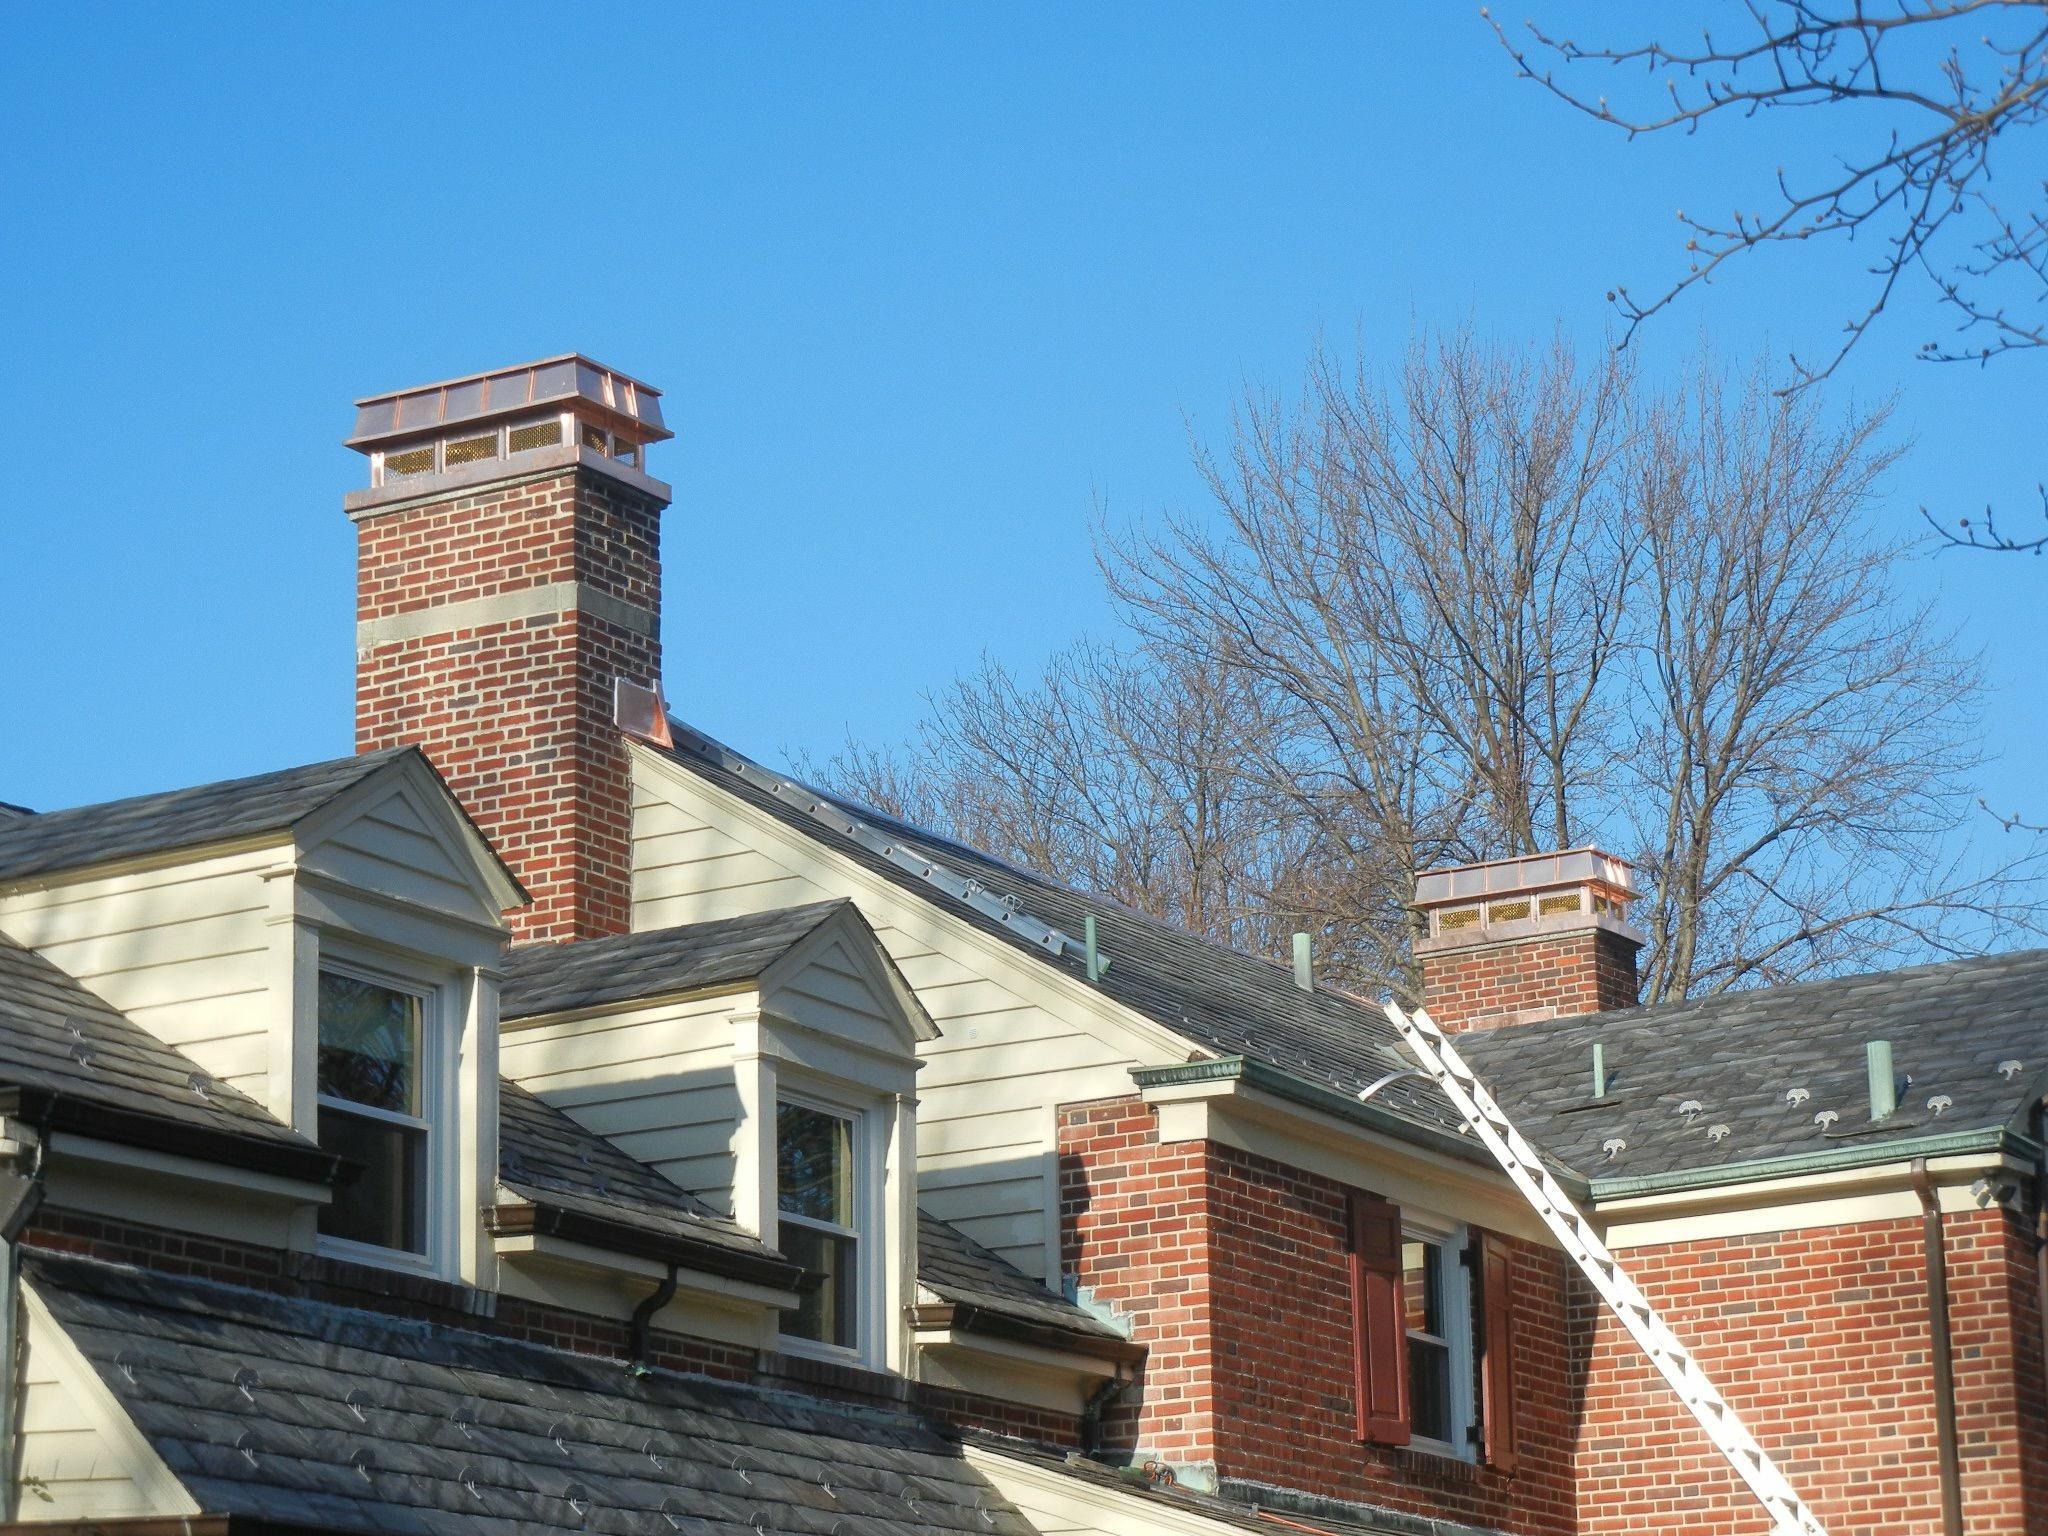 Joey Wildasin Slate Roofing image 36